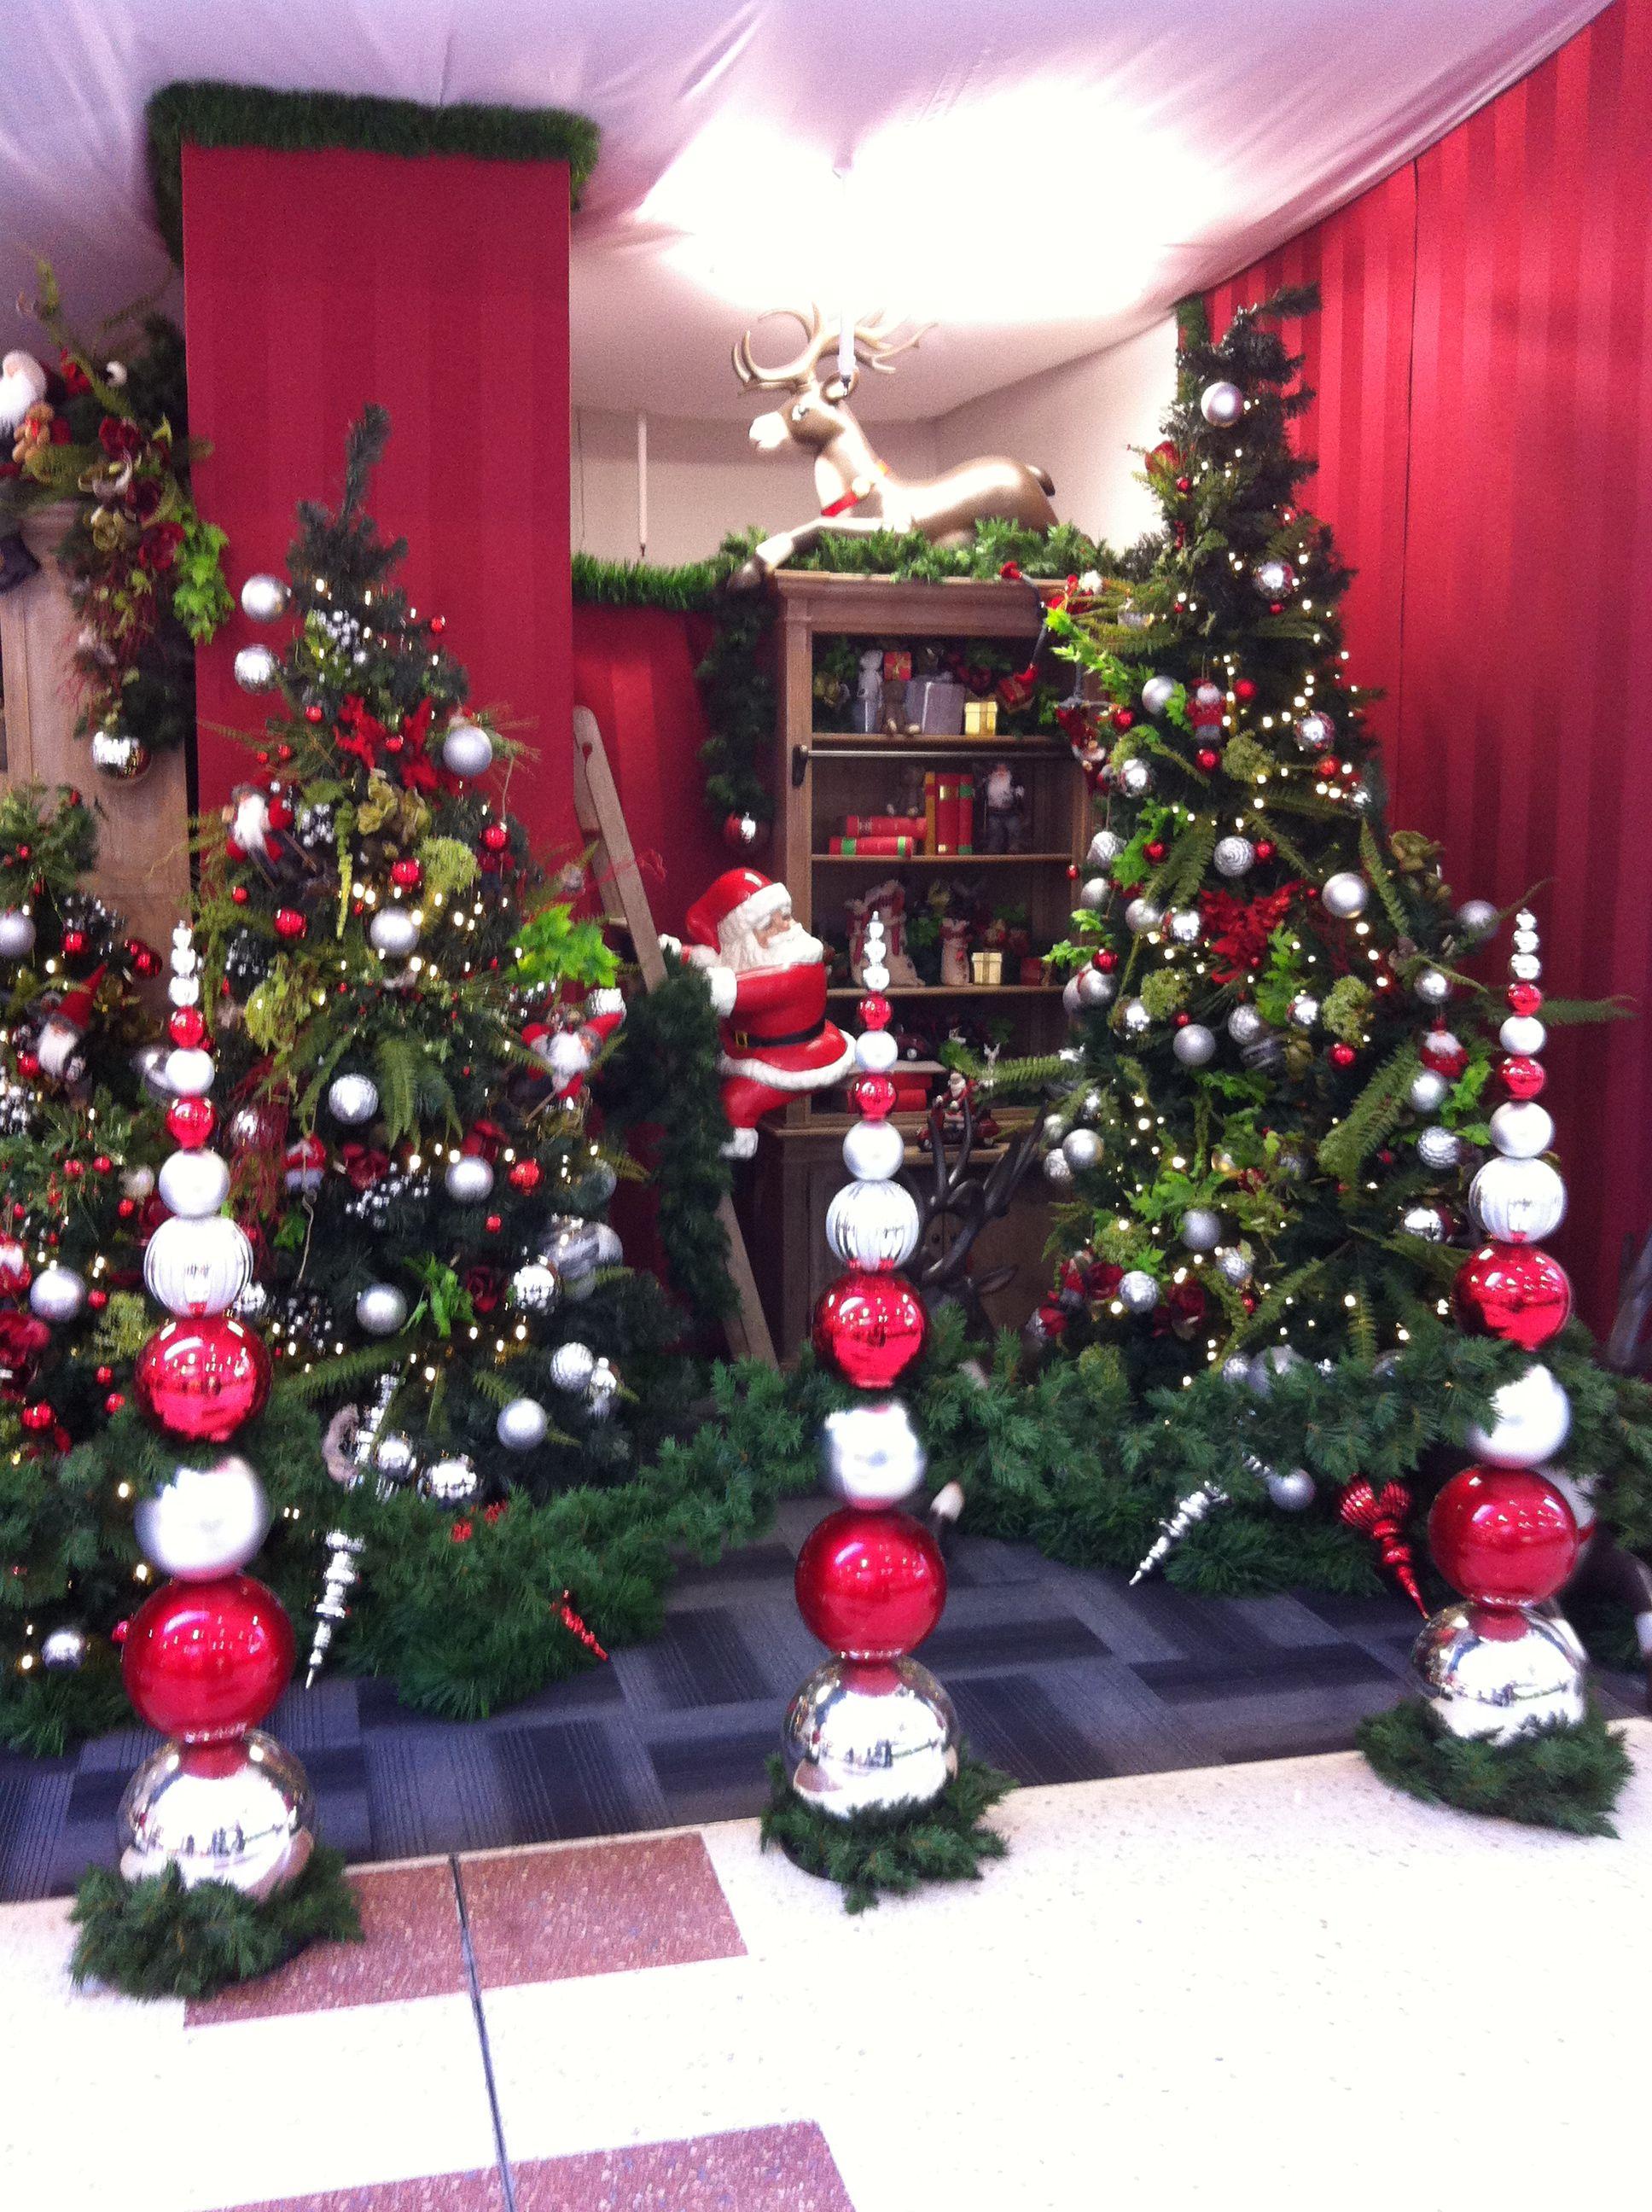 Santa Setting Hamilton New Zealand By Ton Van Der Veer Christmas Display Christmas Window Display Christmas Decorations